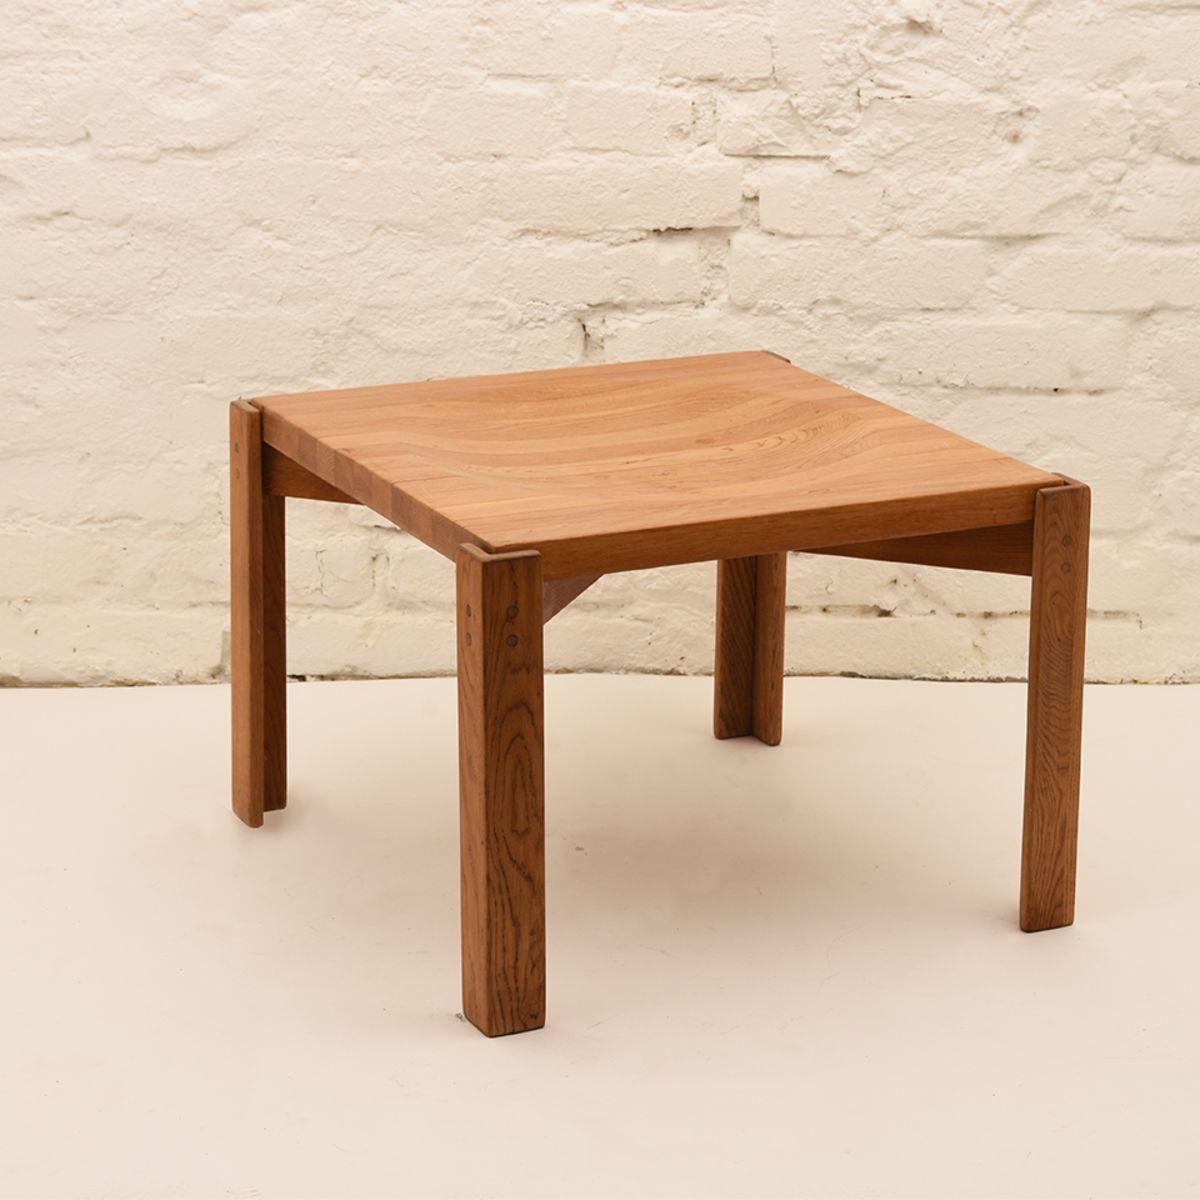 Jens-Quistgaard_Fruit-Table